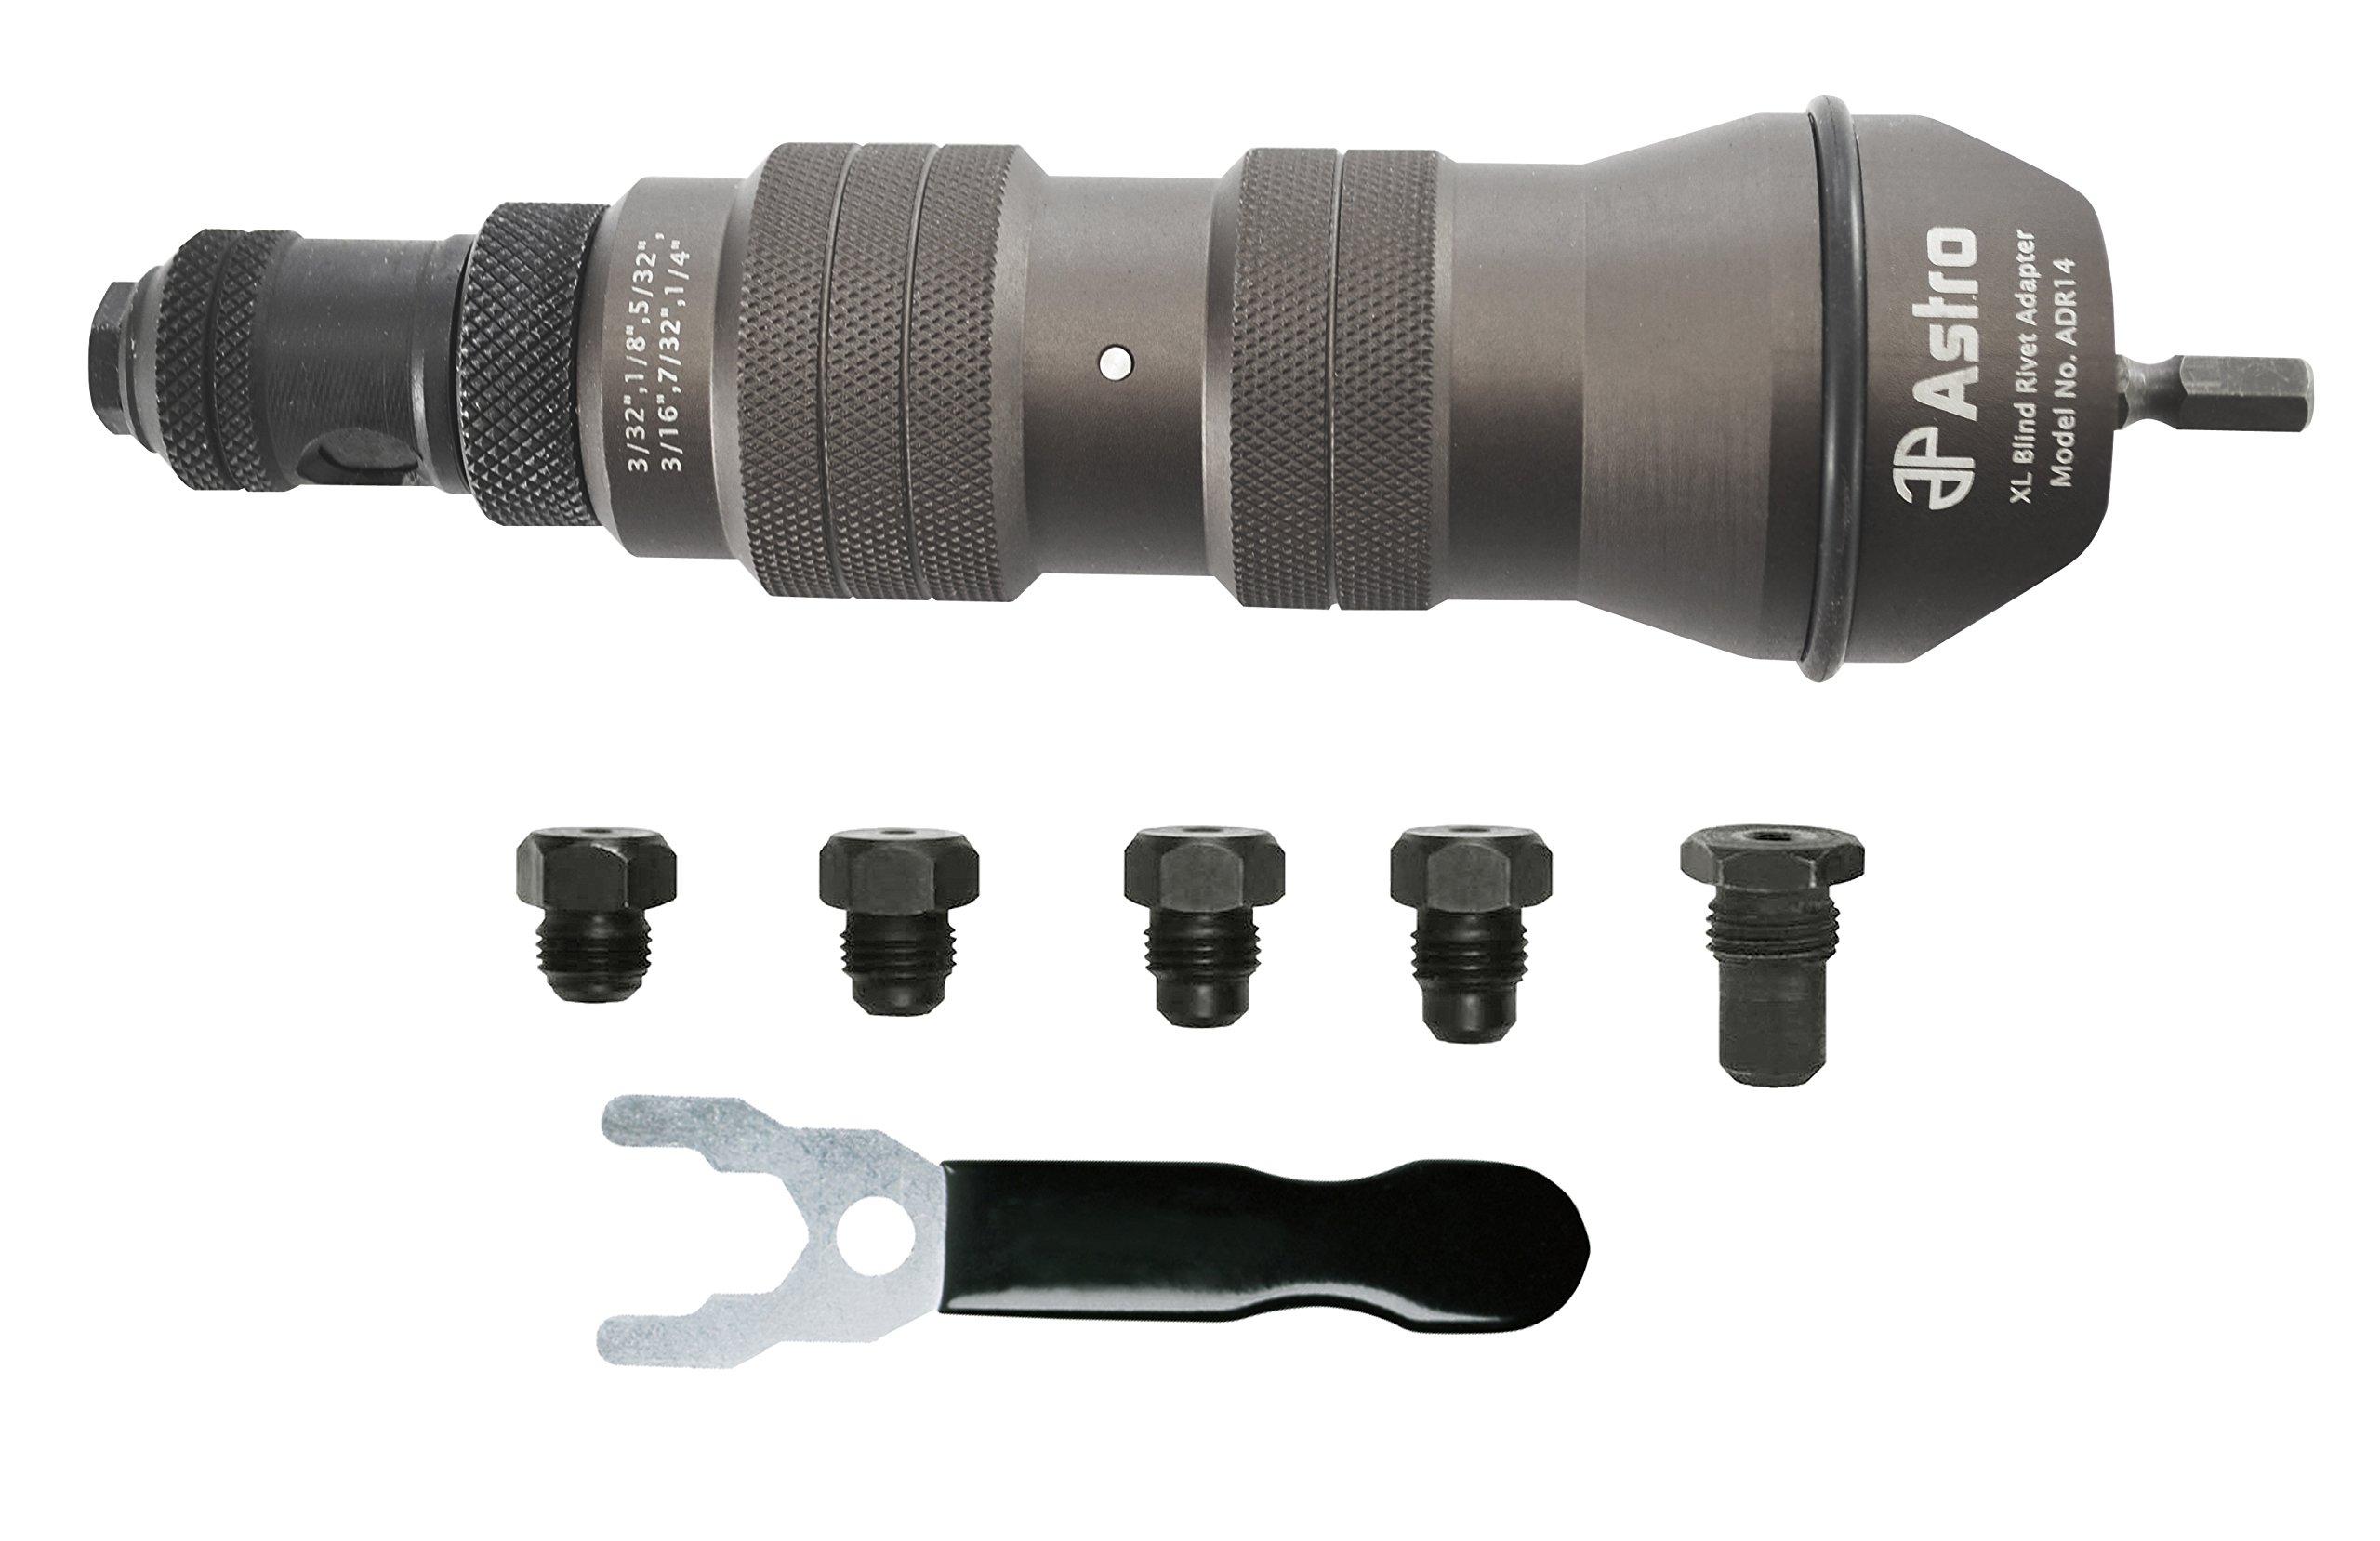 Astro Pneumatic Tool ADR14 XL Blind Rivet Adapter Kit - 1/4'' Capacity by Astro Pneumatic Tool